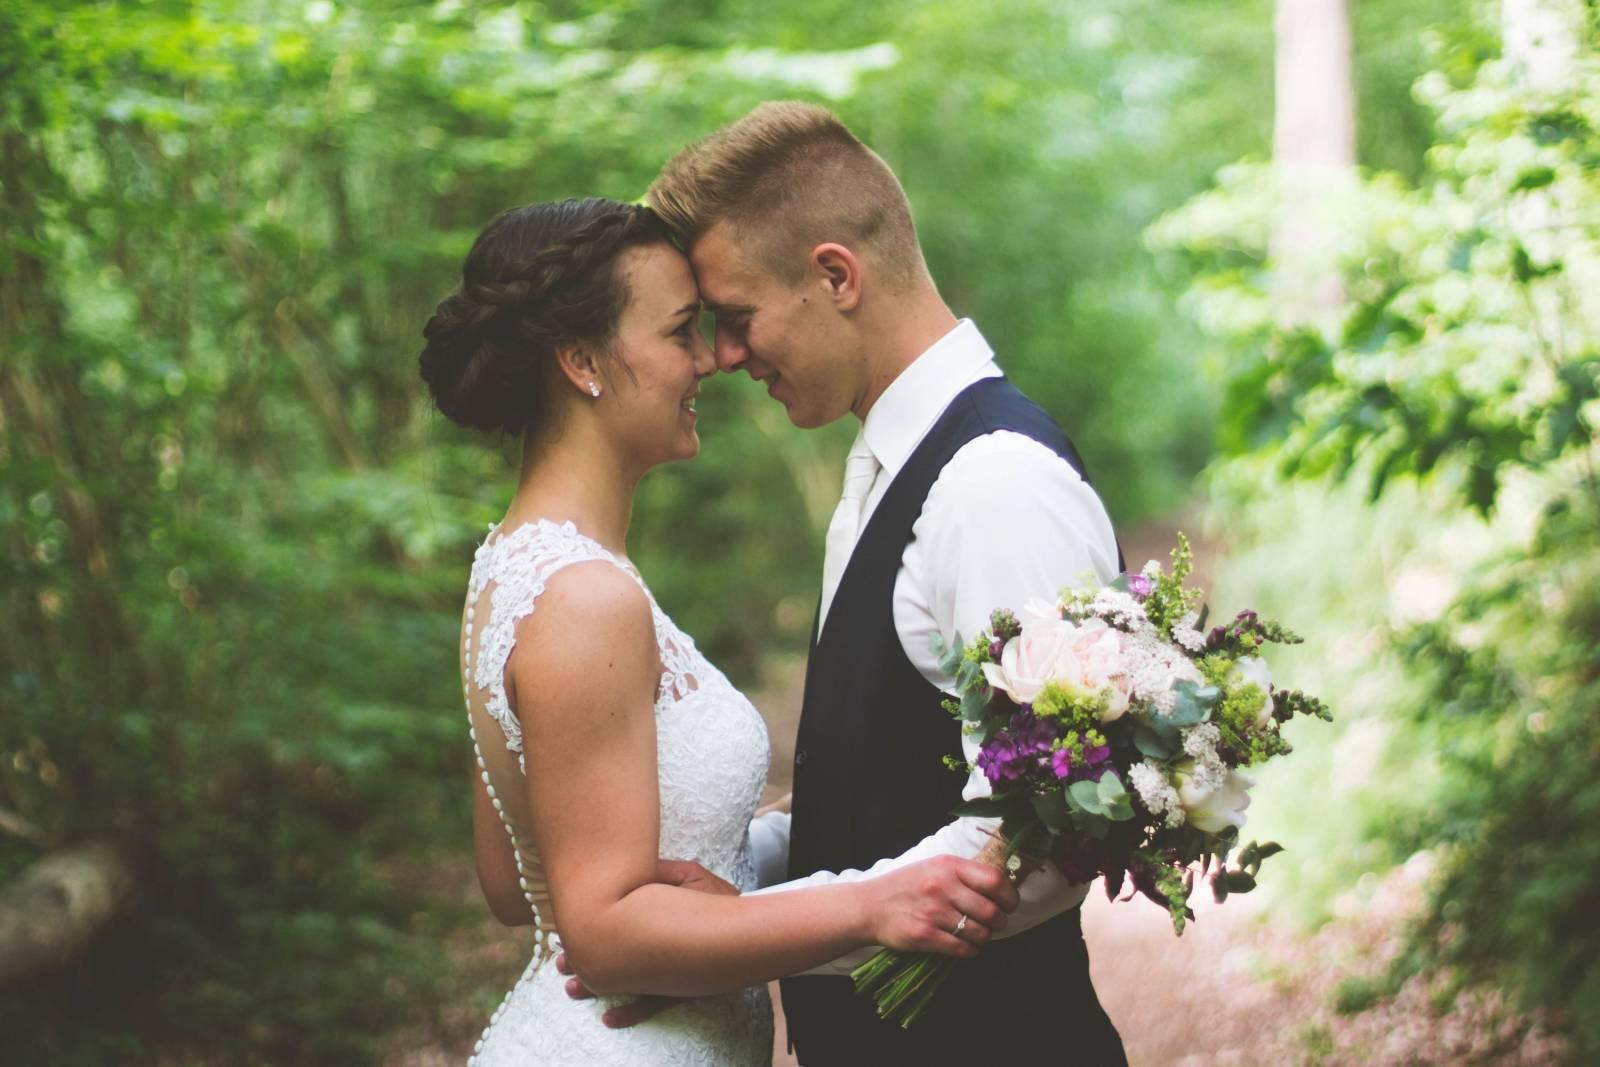 Carpe Diem Bloemen & Decoratie - House of Weddings  - 19